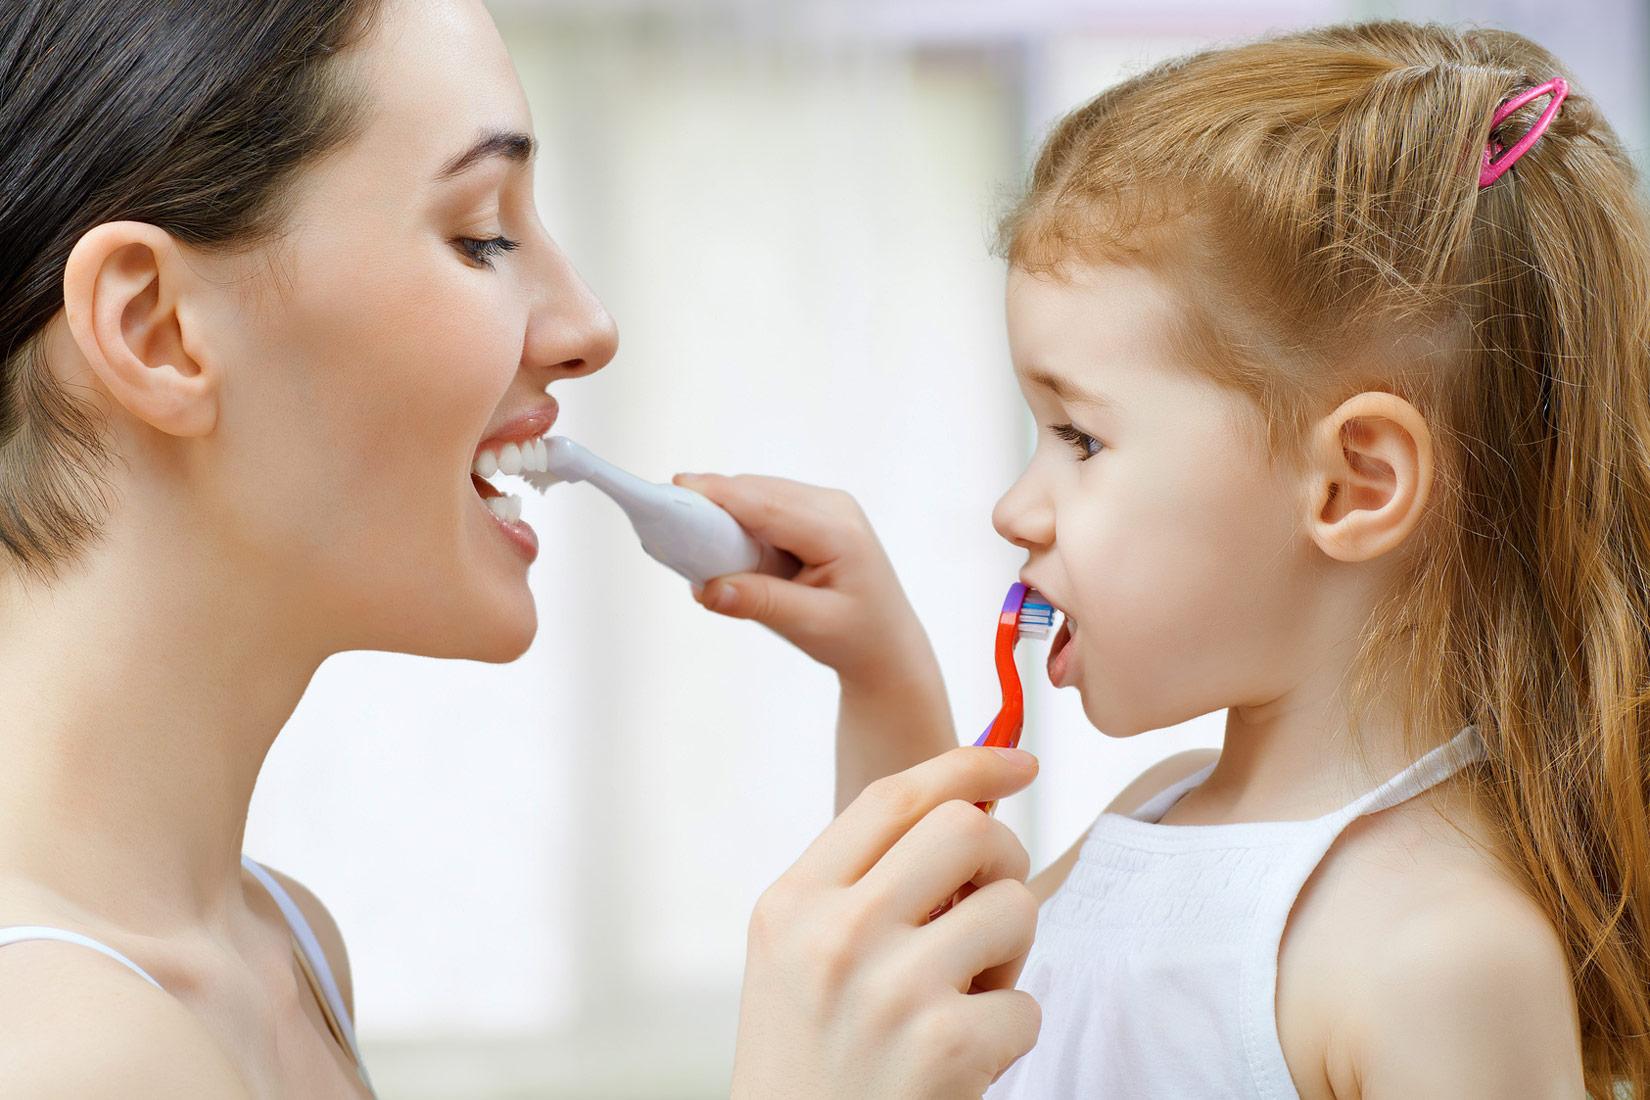 familia_tratamientos_dentales_clinica_mallorca_dentista